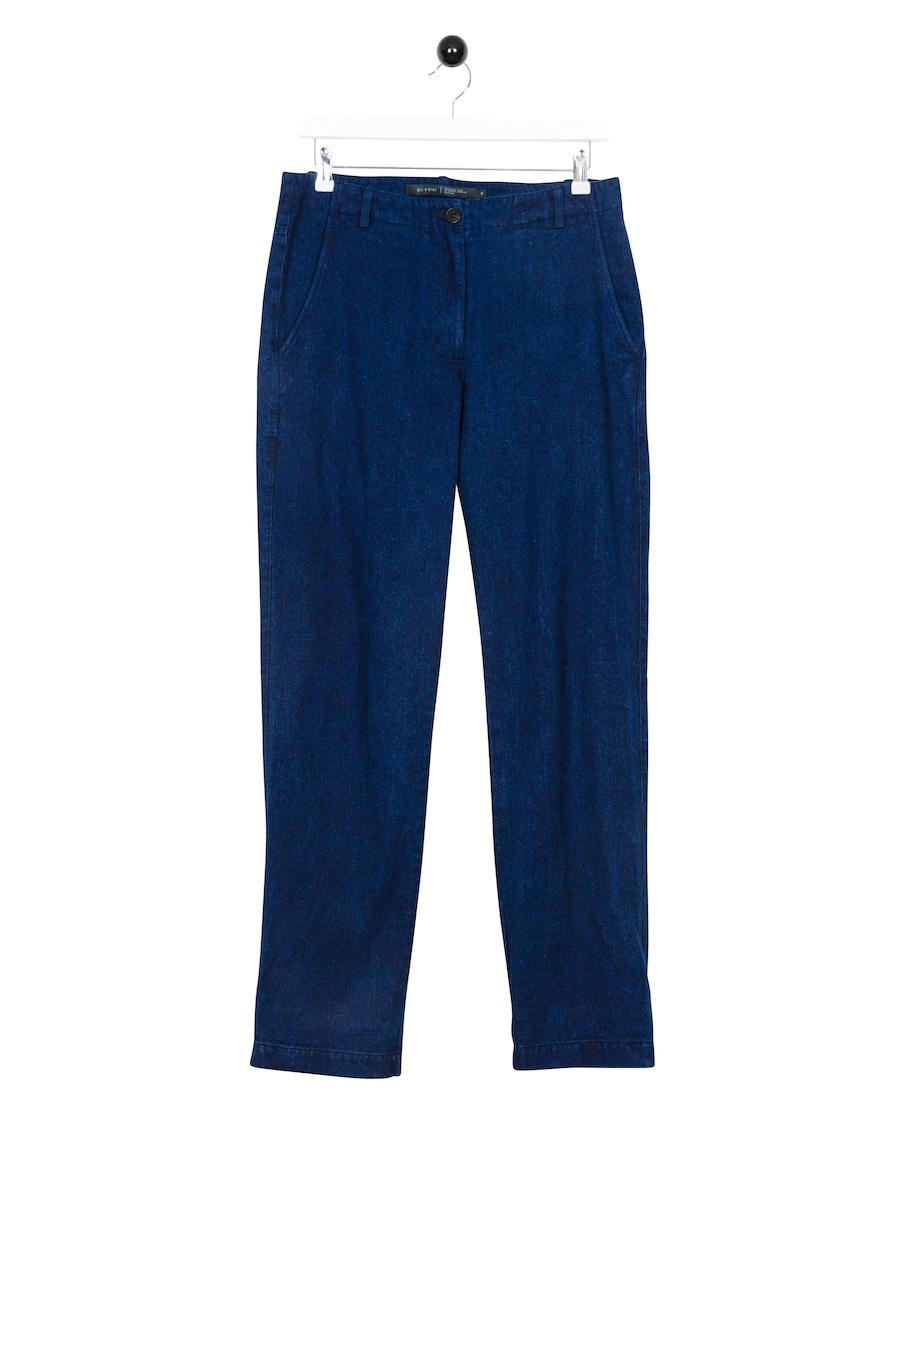 Kobolt Trousers